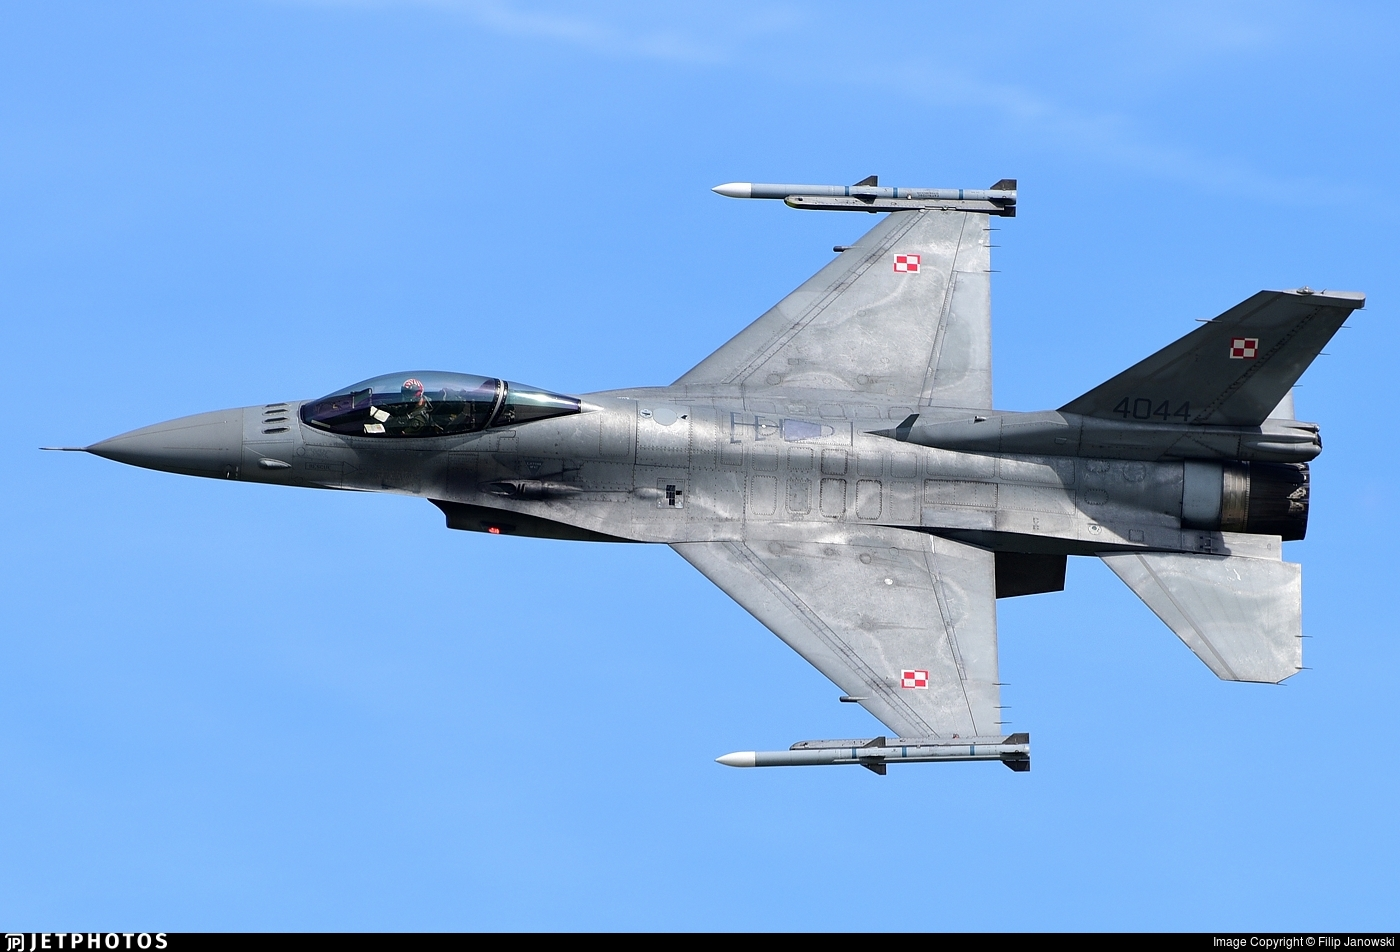 4044 - Lockheed Martin F-16C Fighting Falcon - Poland - Air Force